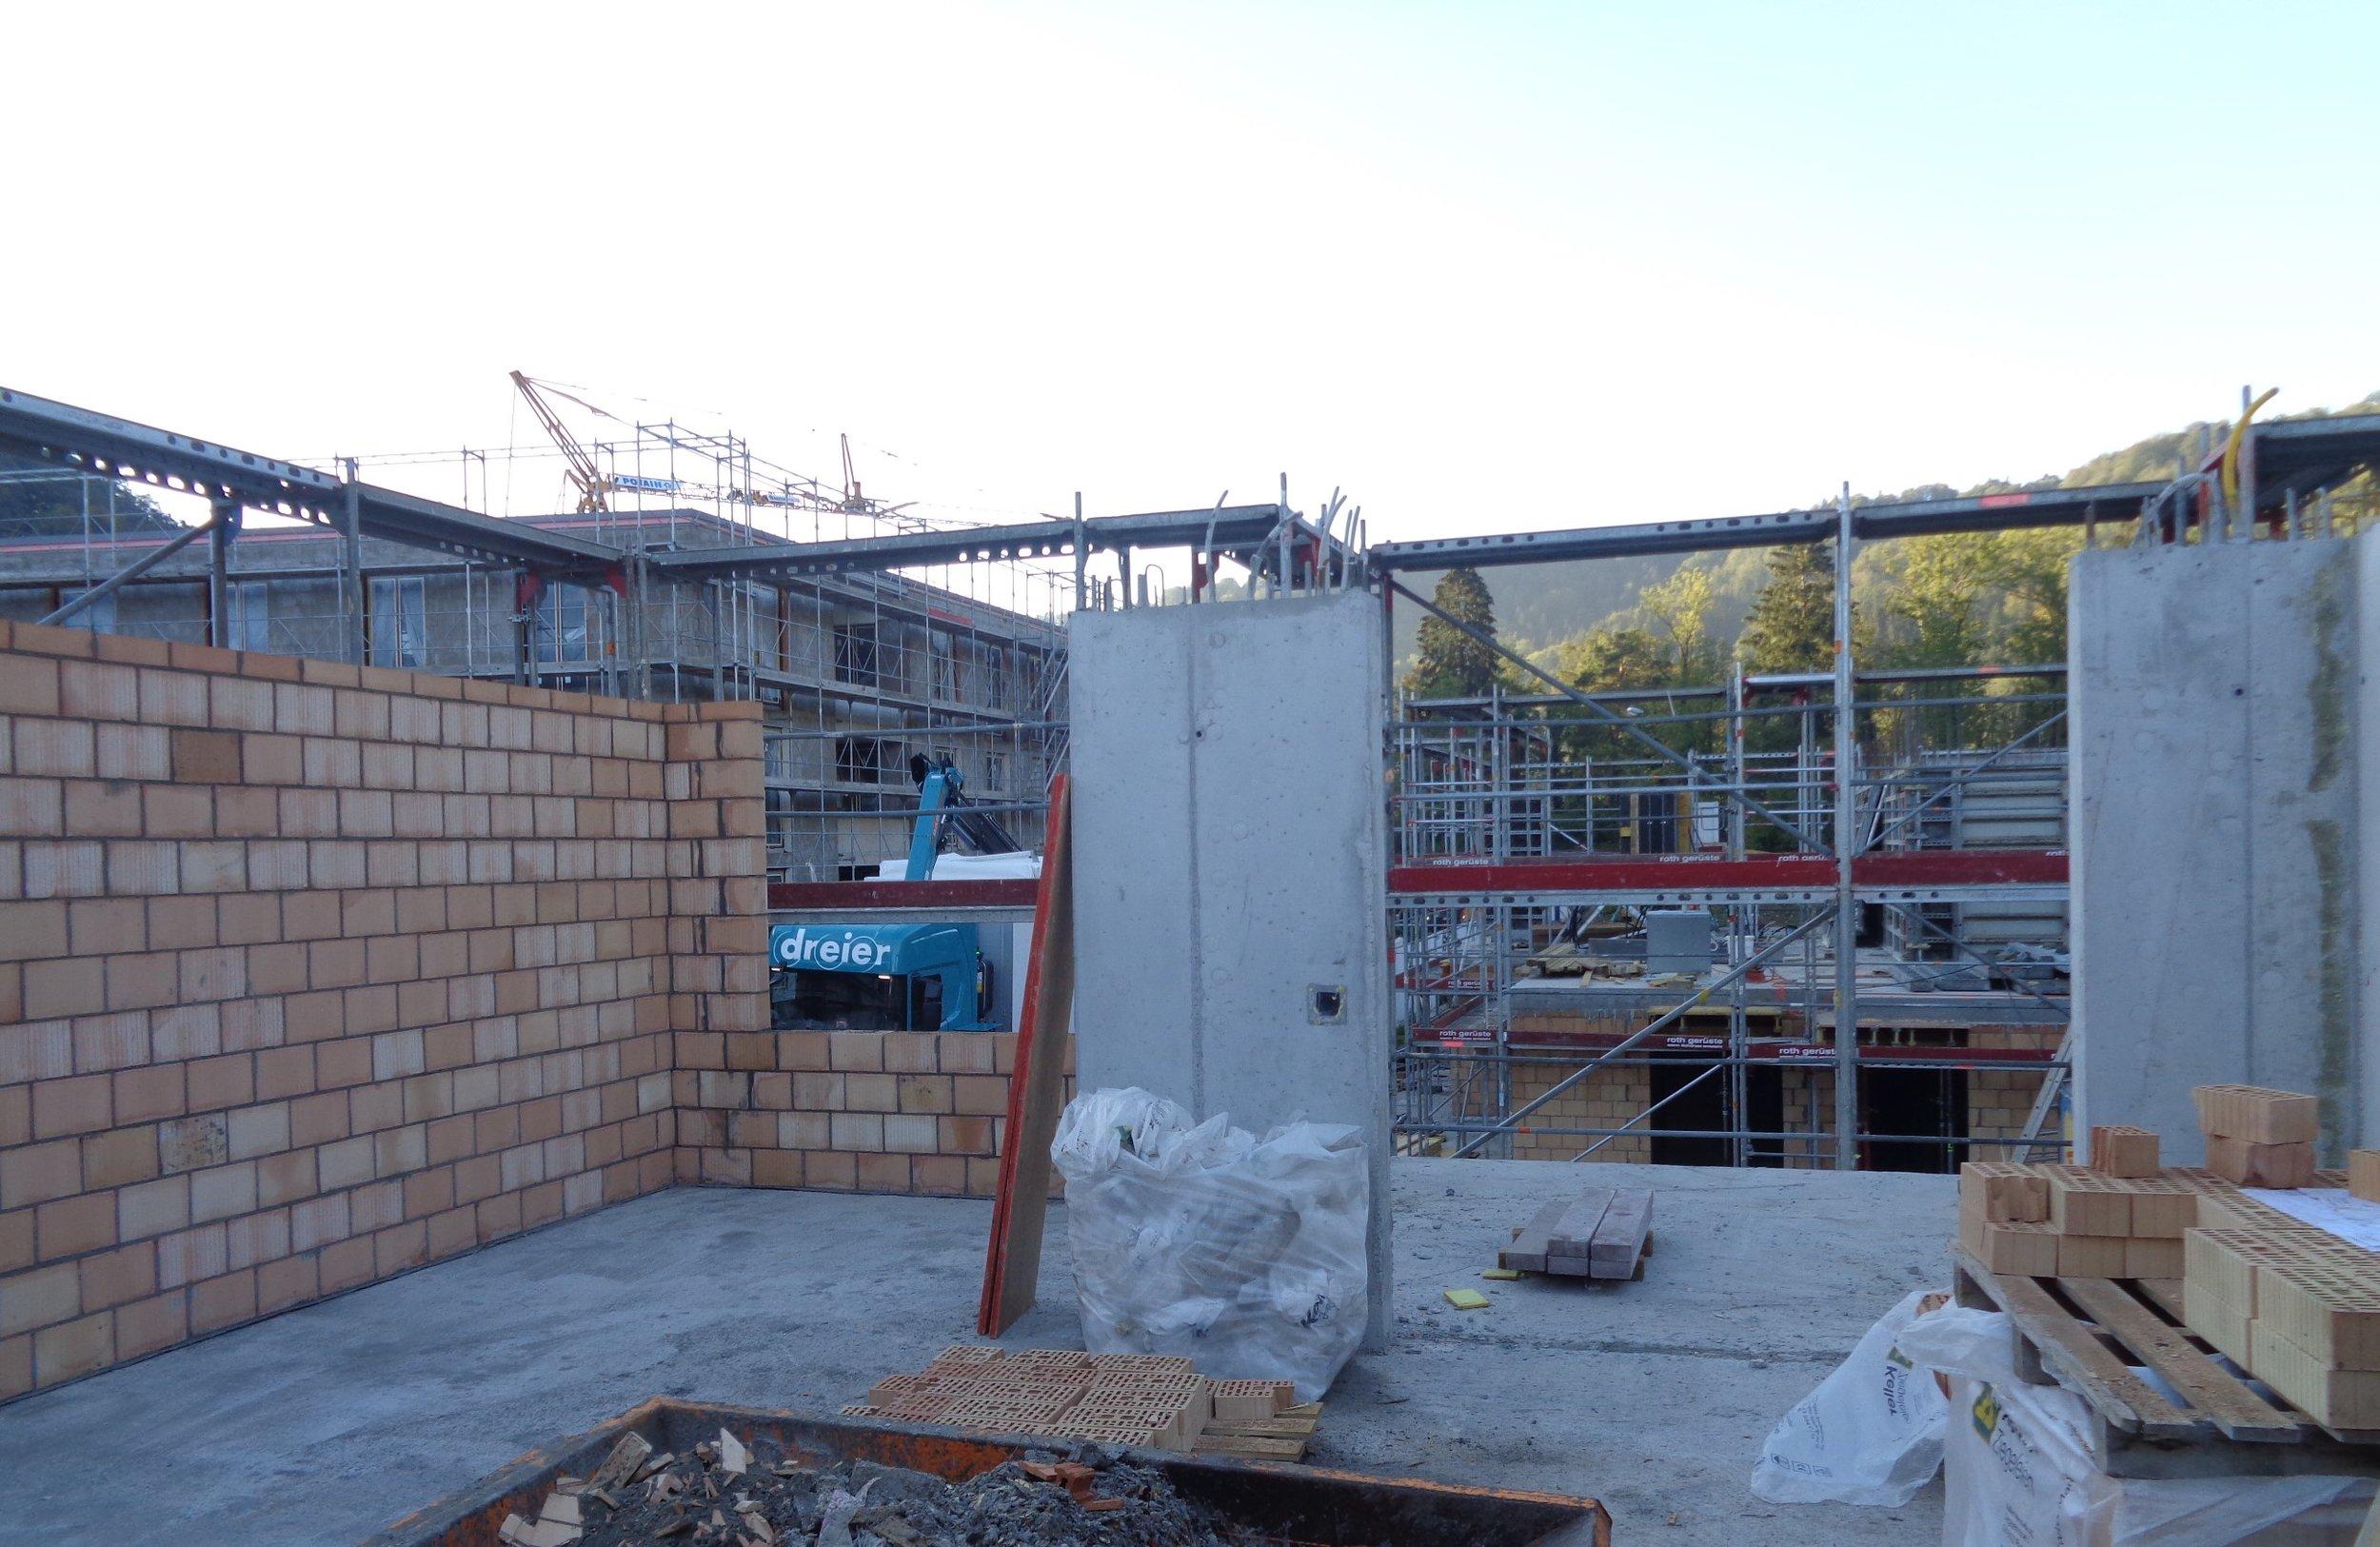 Baumeisterarbeiten Überbauung NIDO Sennhof Winterthur Verkauf Boll Immobilien Neubauprojekt